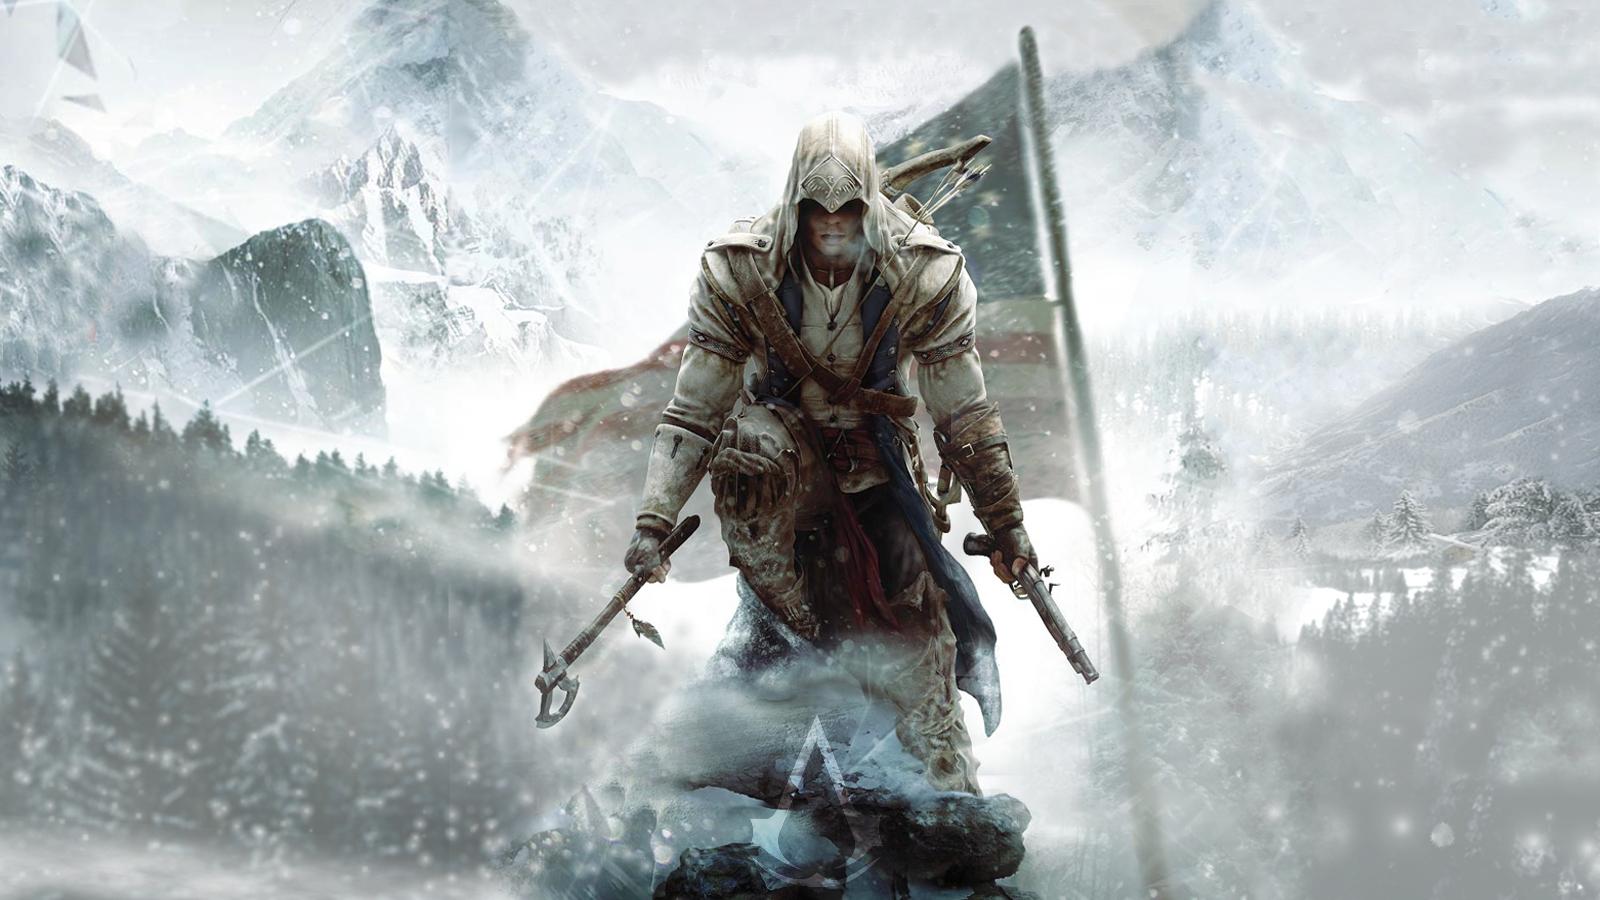 Assassins Creed 3 Wallpaper By Pablodoogenfloggen On Deviantart